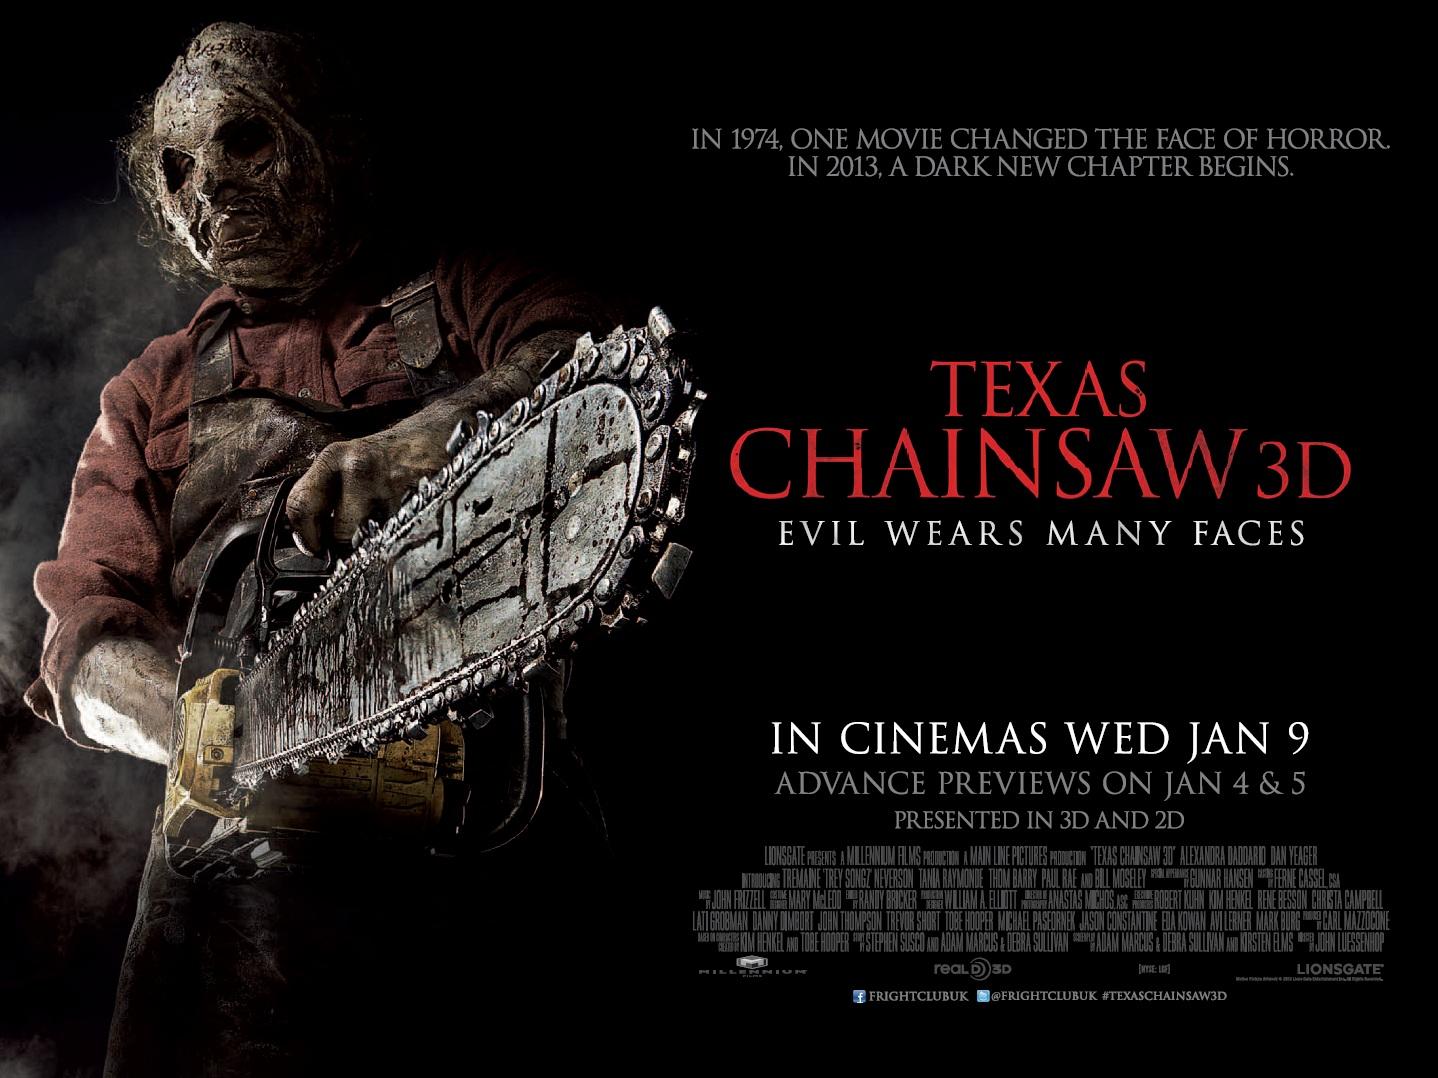 Texas-Chainsaw-3D-UK-Quad-Poster.jpg